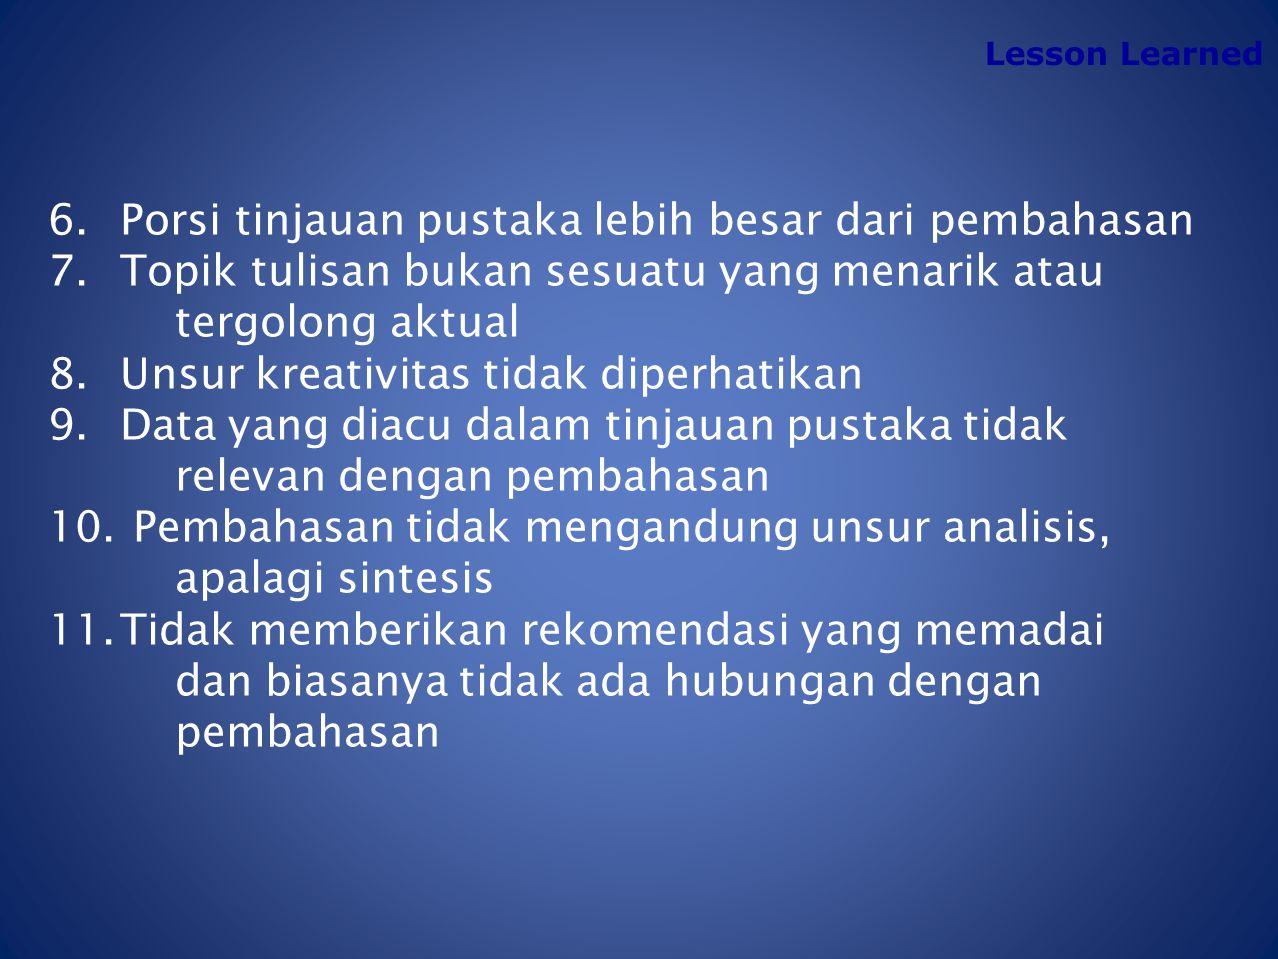 Lesson Learned Kesalahan Yang Sering Dijumpai Dalam Makalah 1. Menulis hasil penelitian eksperimental 2. Judul terlalu panjang : lebih dari 12 kata (d